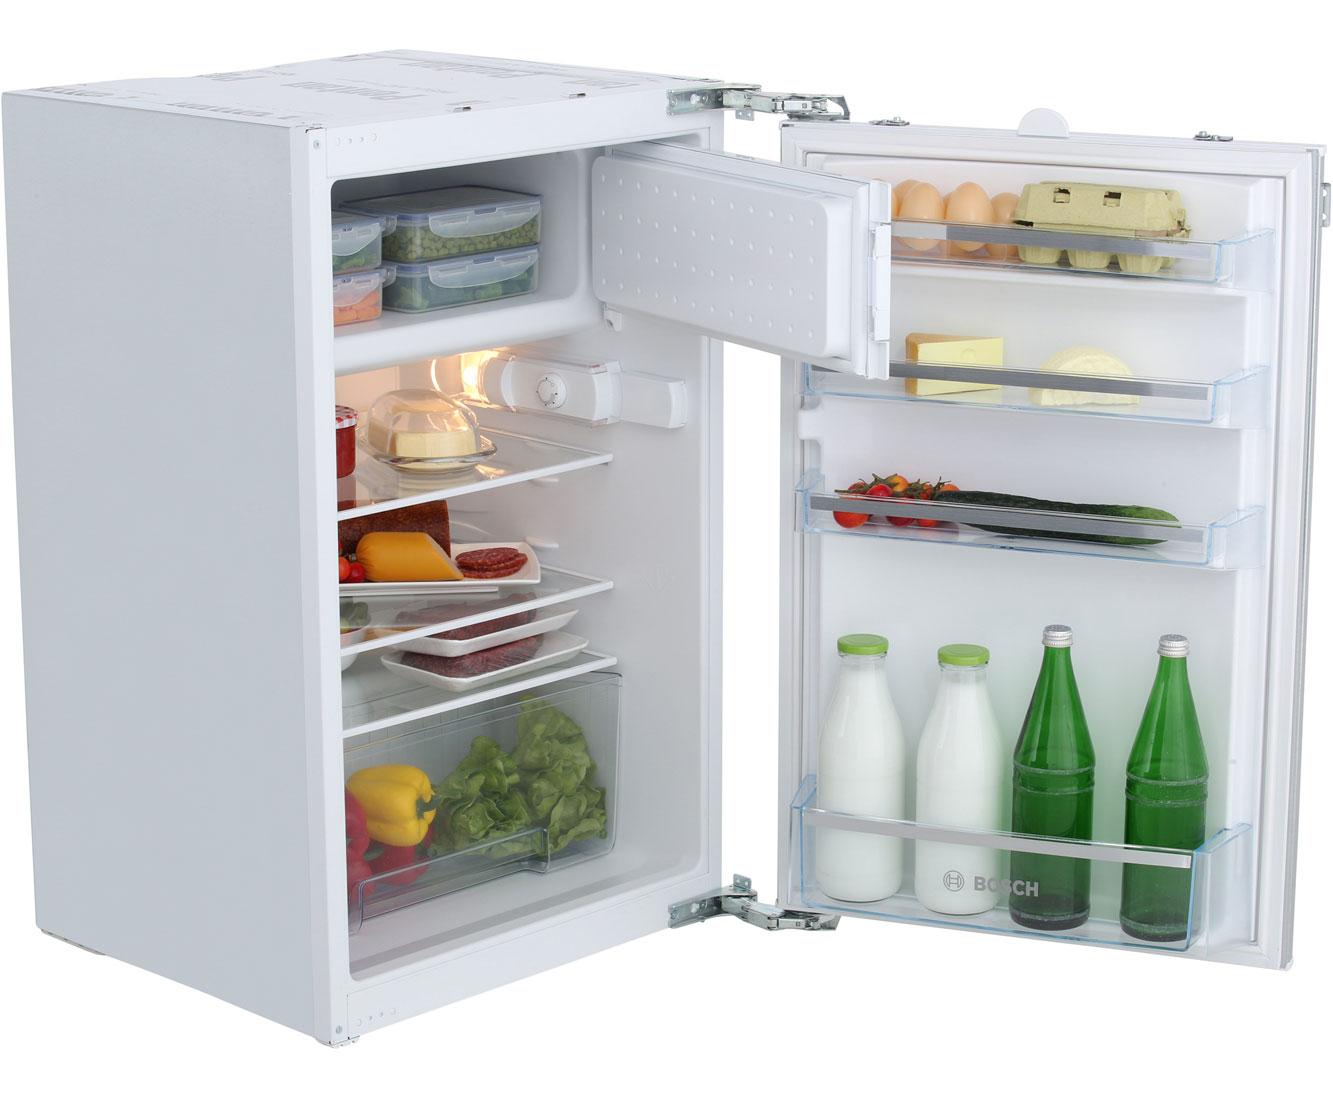 Bosch Kühlschrank Groß : Bosch kil v serie kühlschrank eingebaut cm weiss neu ebay